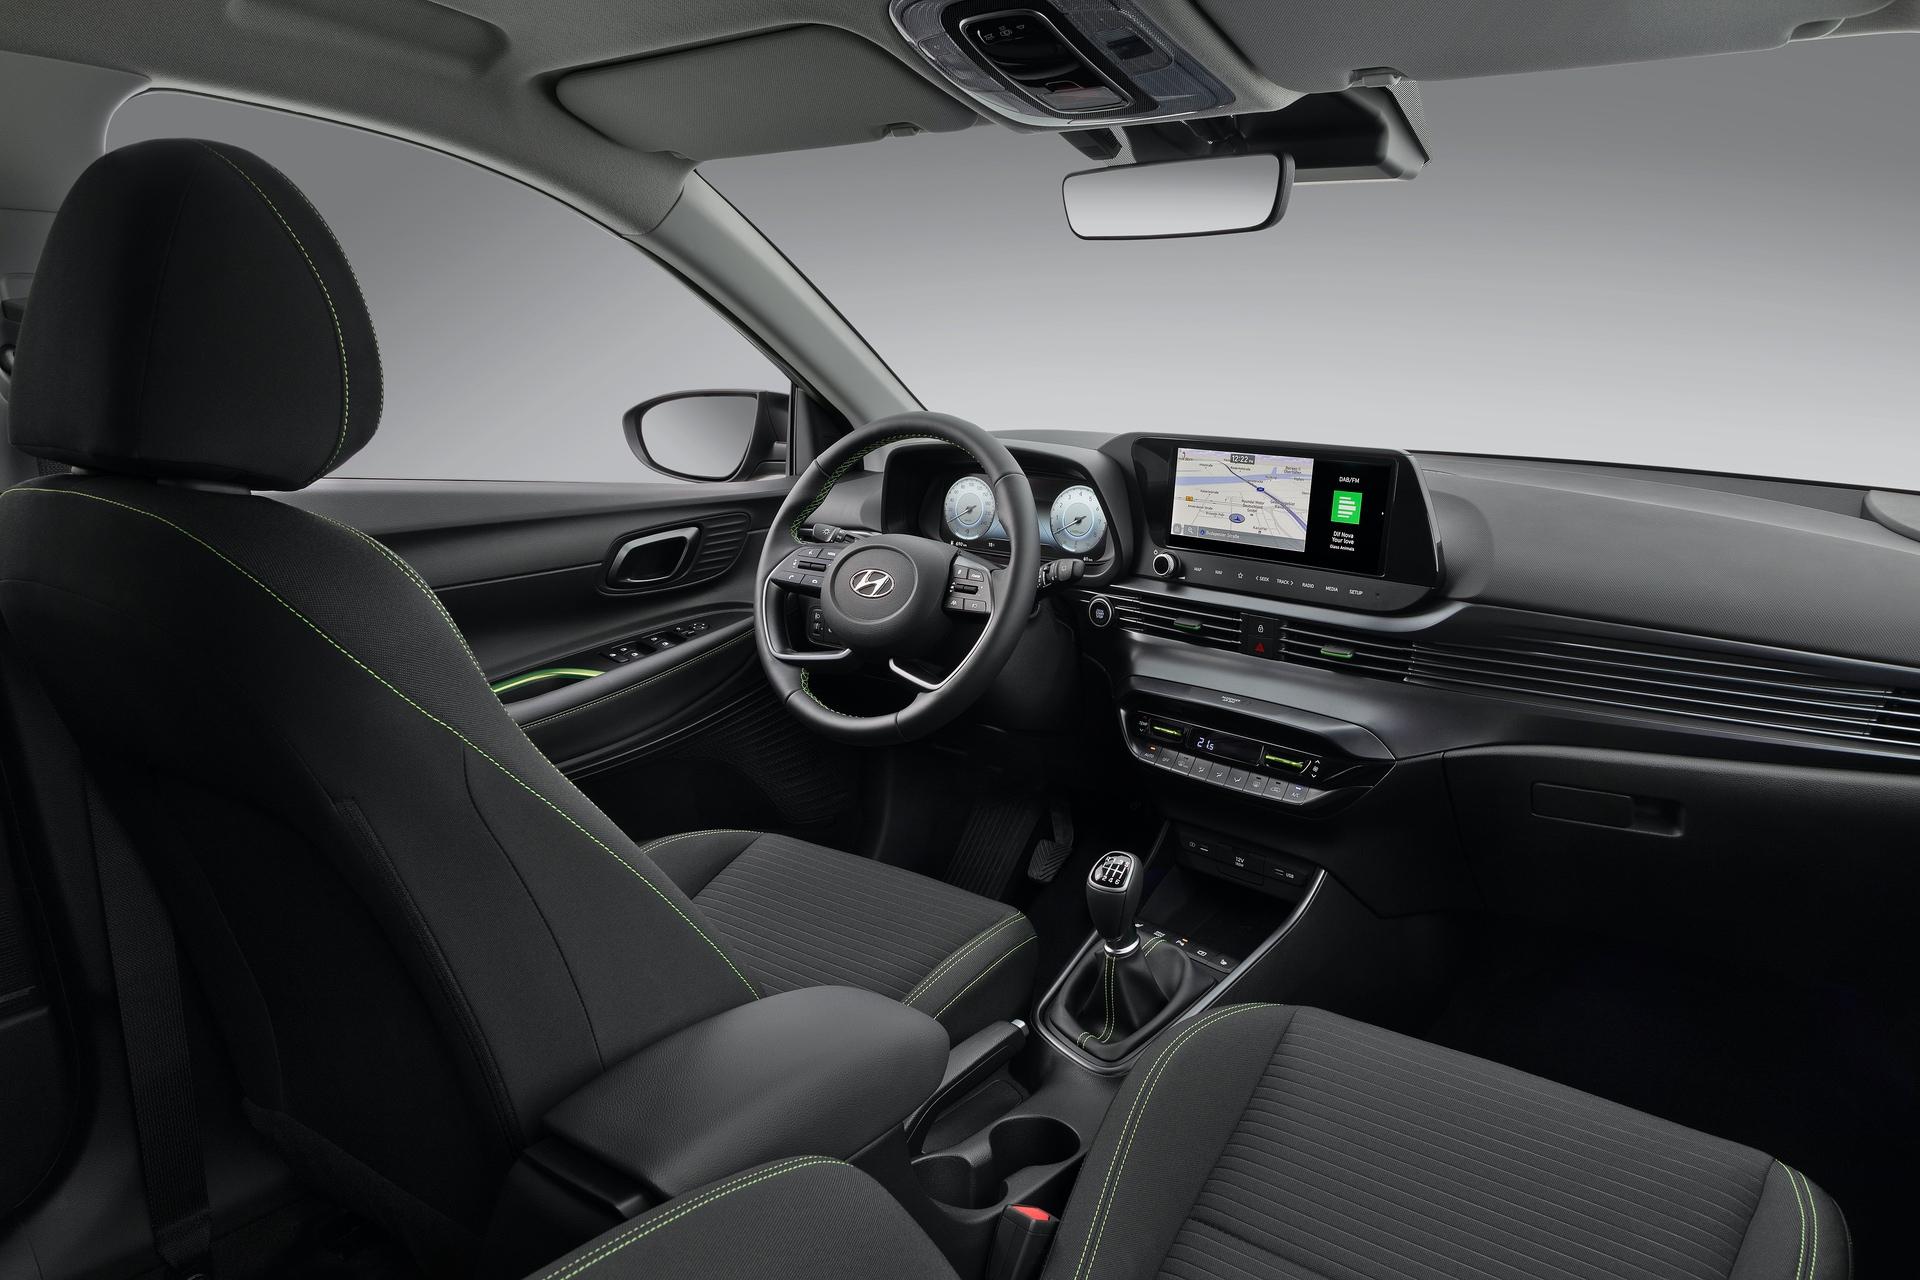 Hyundai_i20_interior_0004